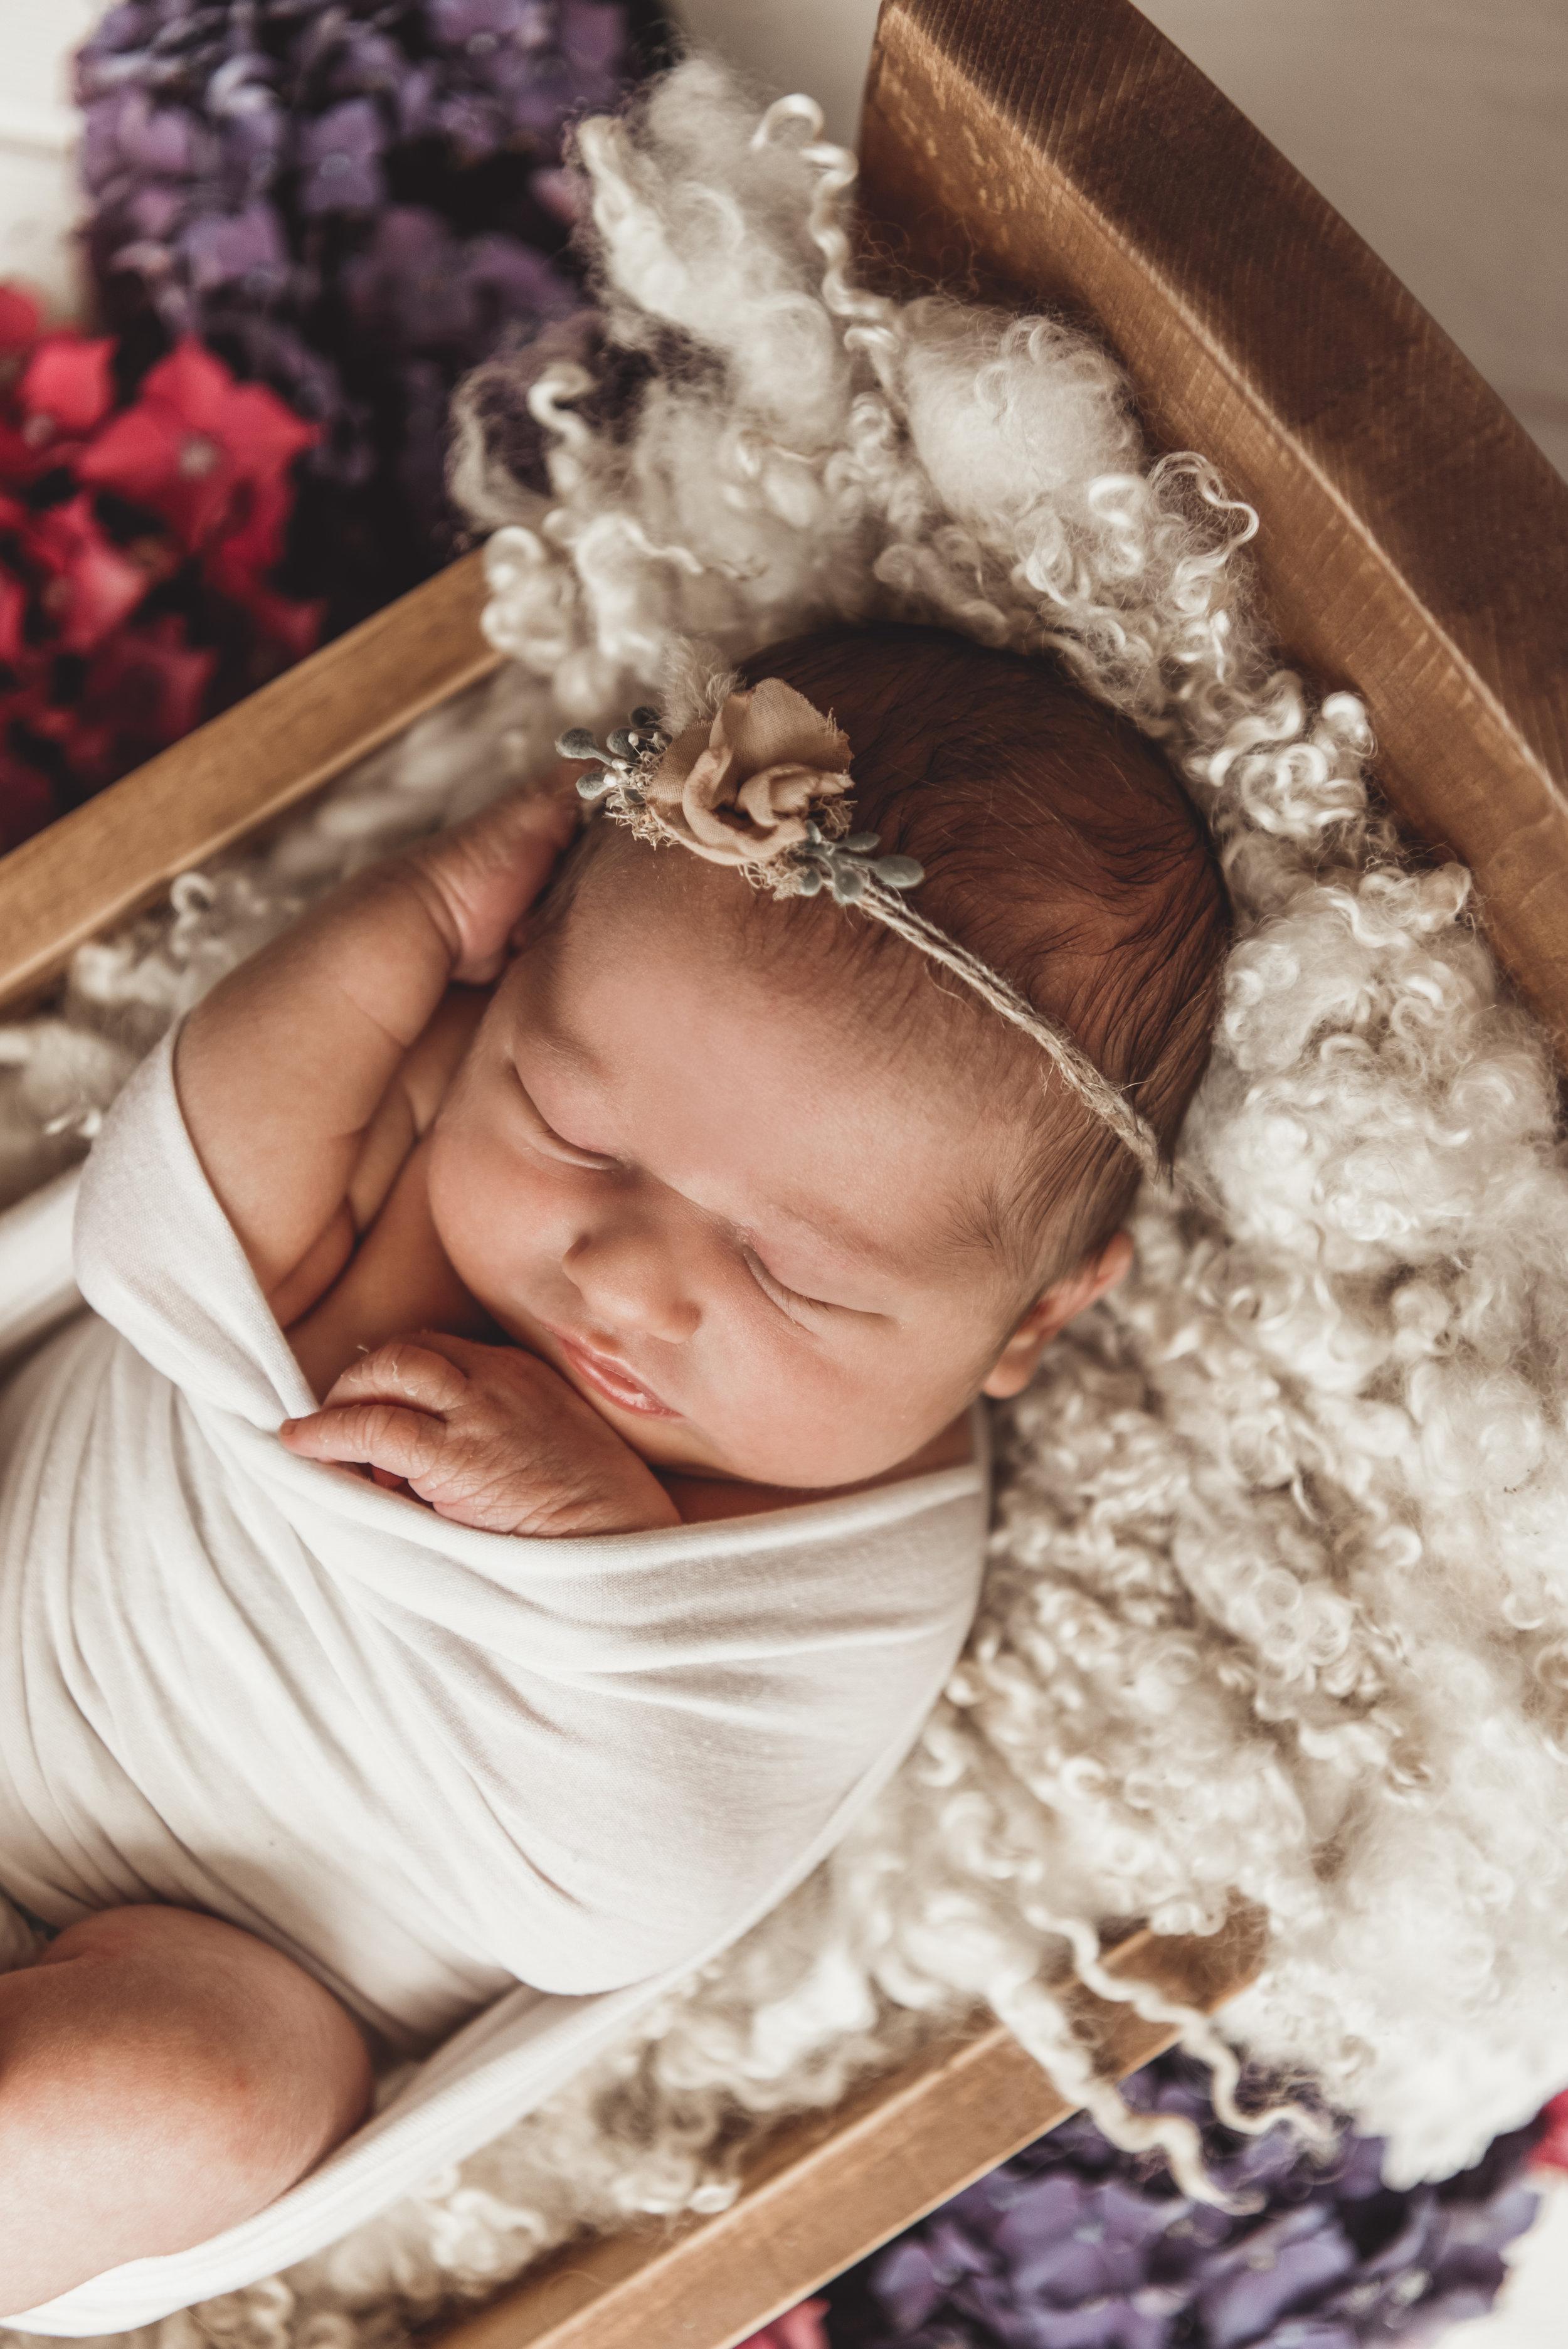 Newborn Ruby Rose - Kathleen Woods - Laura Olson Photography - Sunshine Coast BC Photographer25.jpg